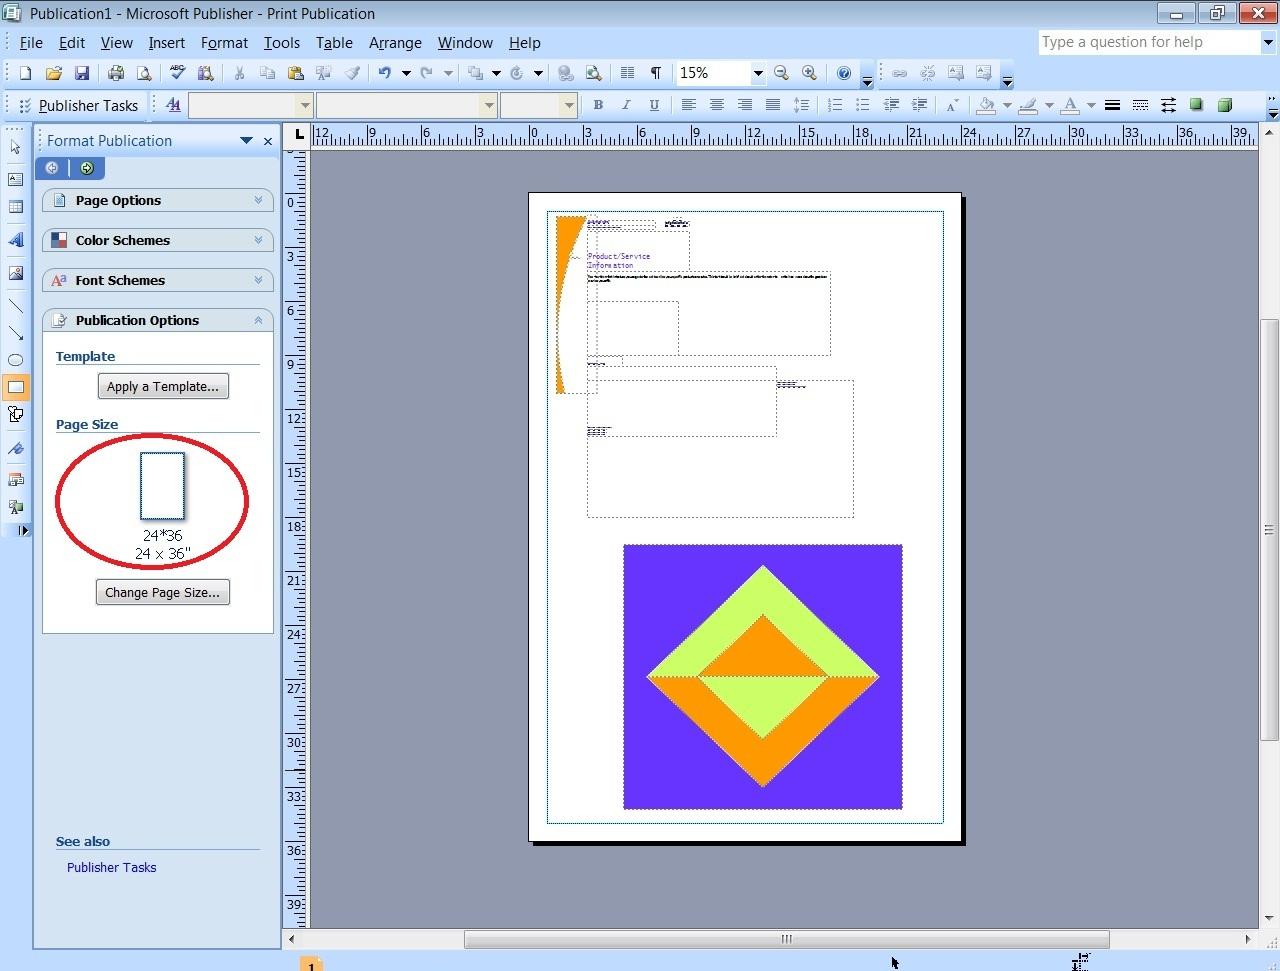 HP DesignJet T120: Hp Designjet T120 editor blank posters